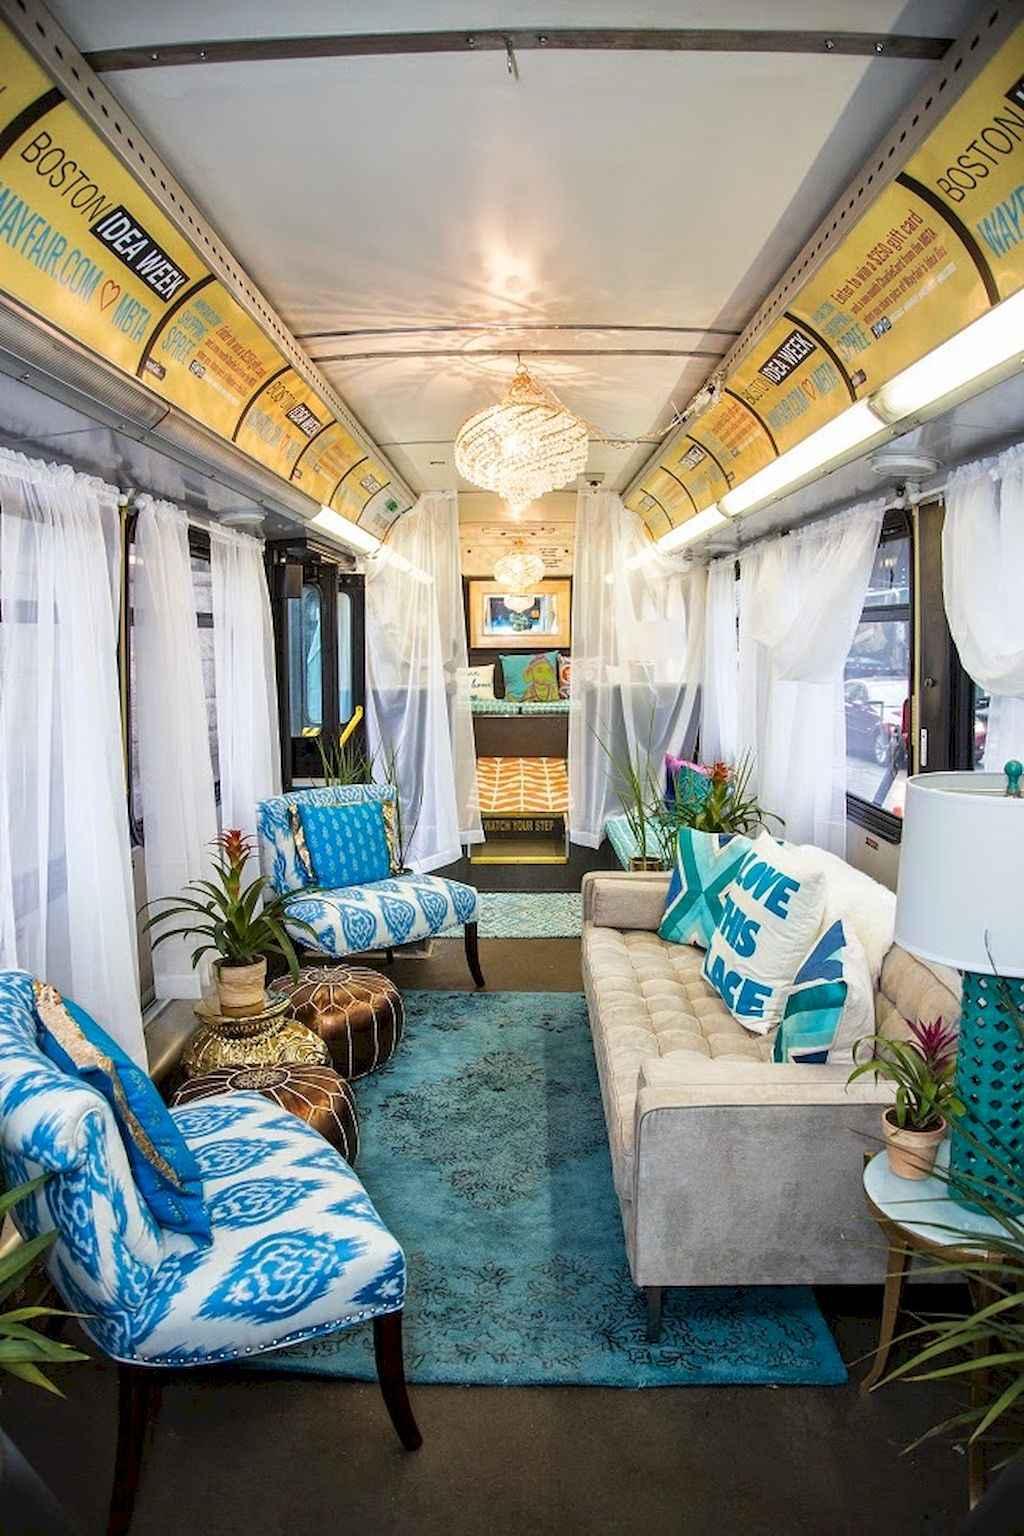 Home Interior Ideas: 20 School Bus Camper Interior Design And Plans Ideas To